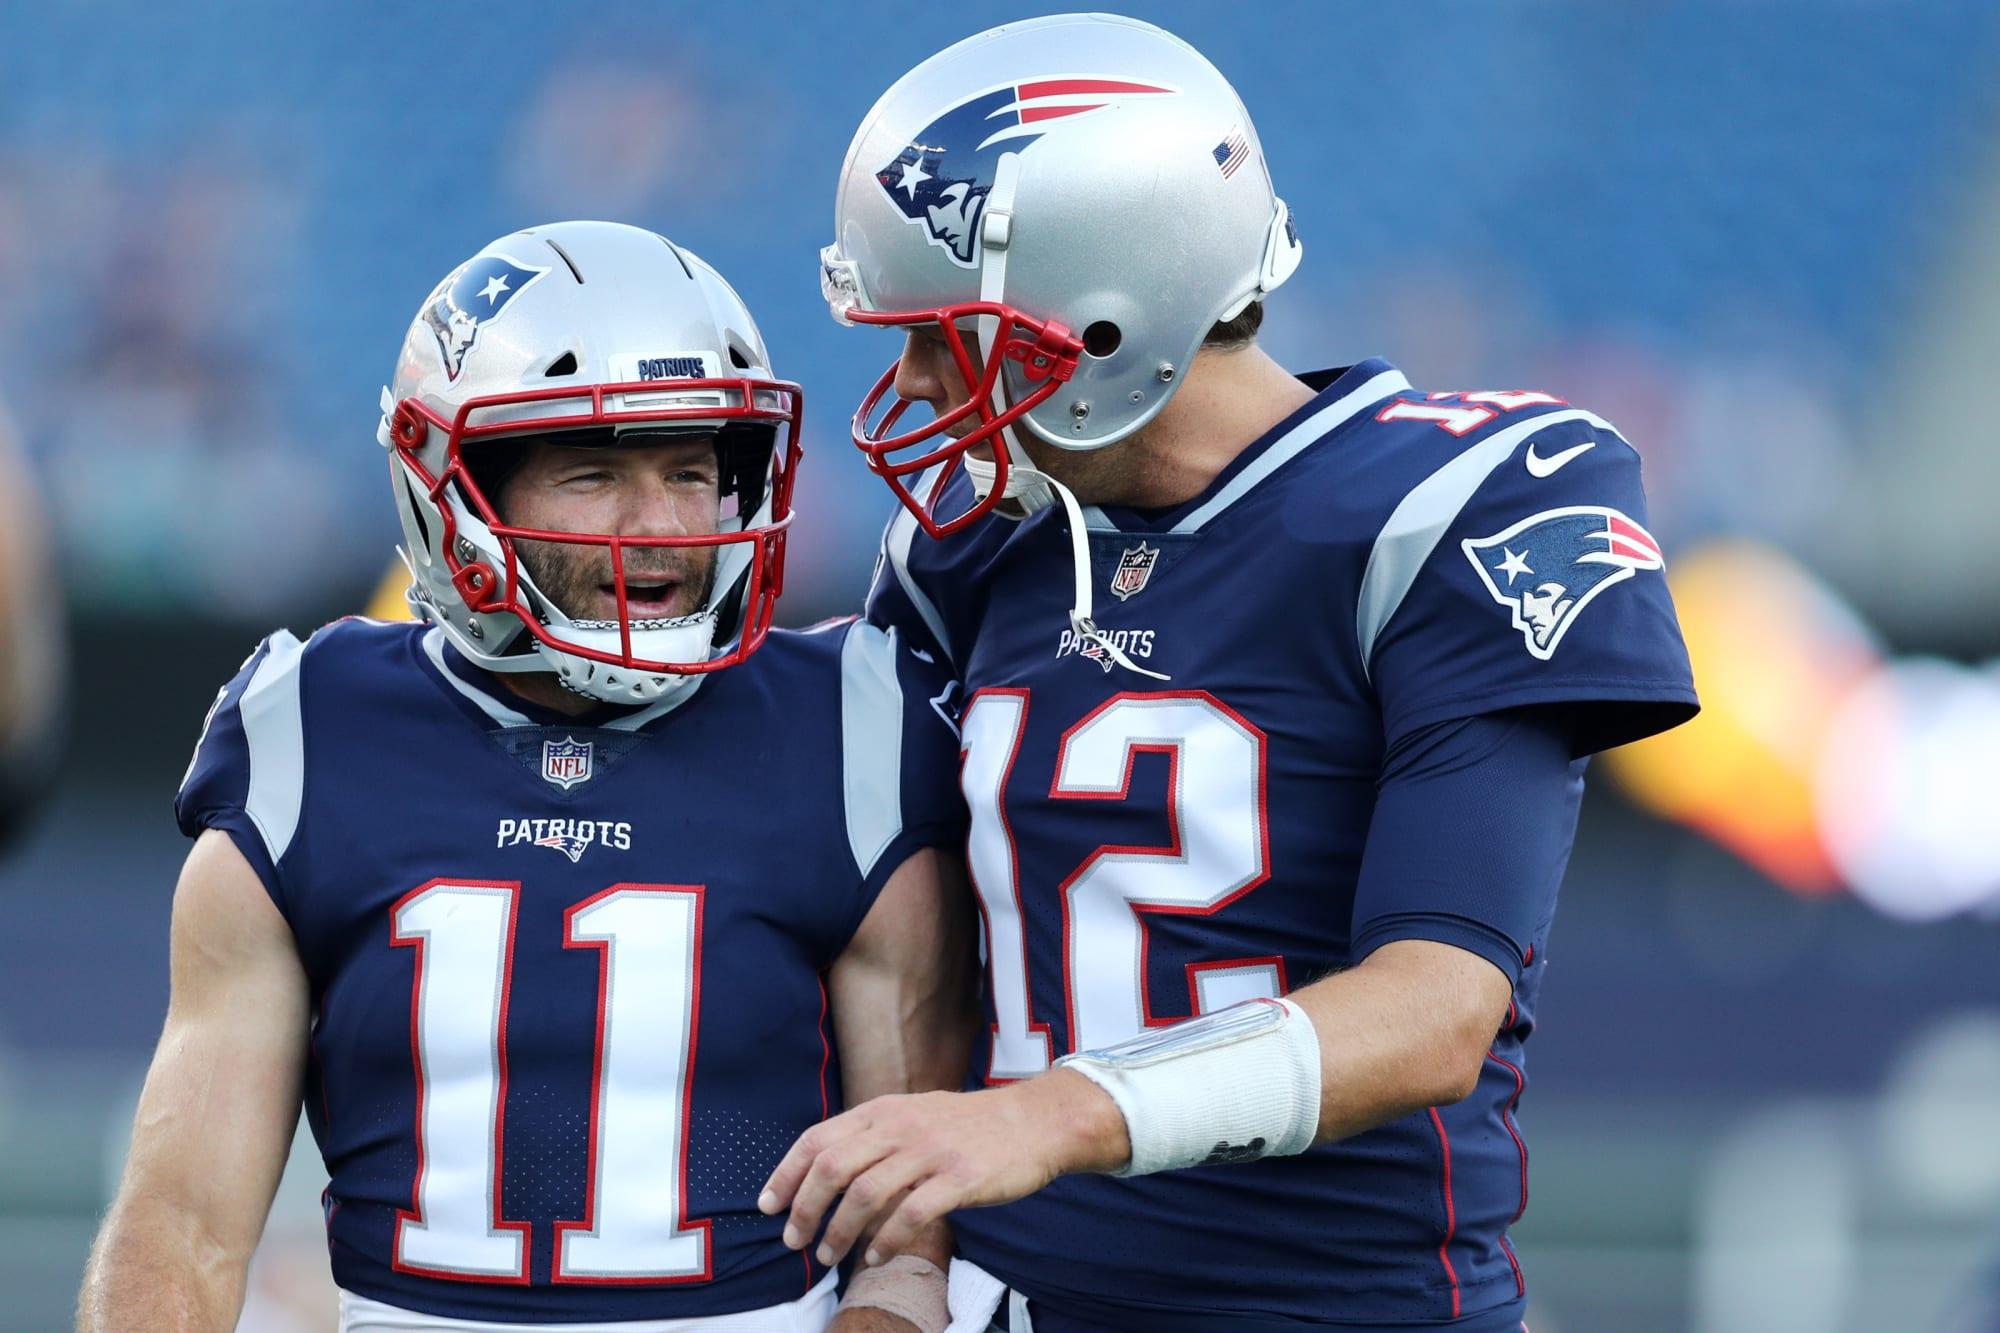 Patriots: Tom Brady has hilarious response to Julian Edelman's retirement